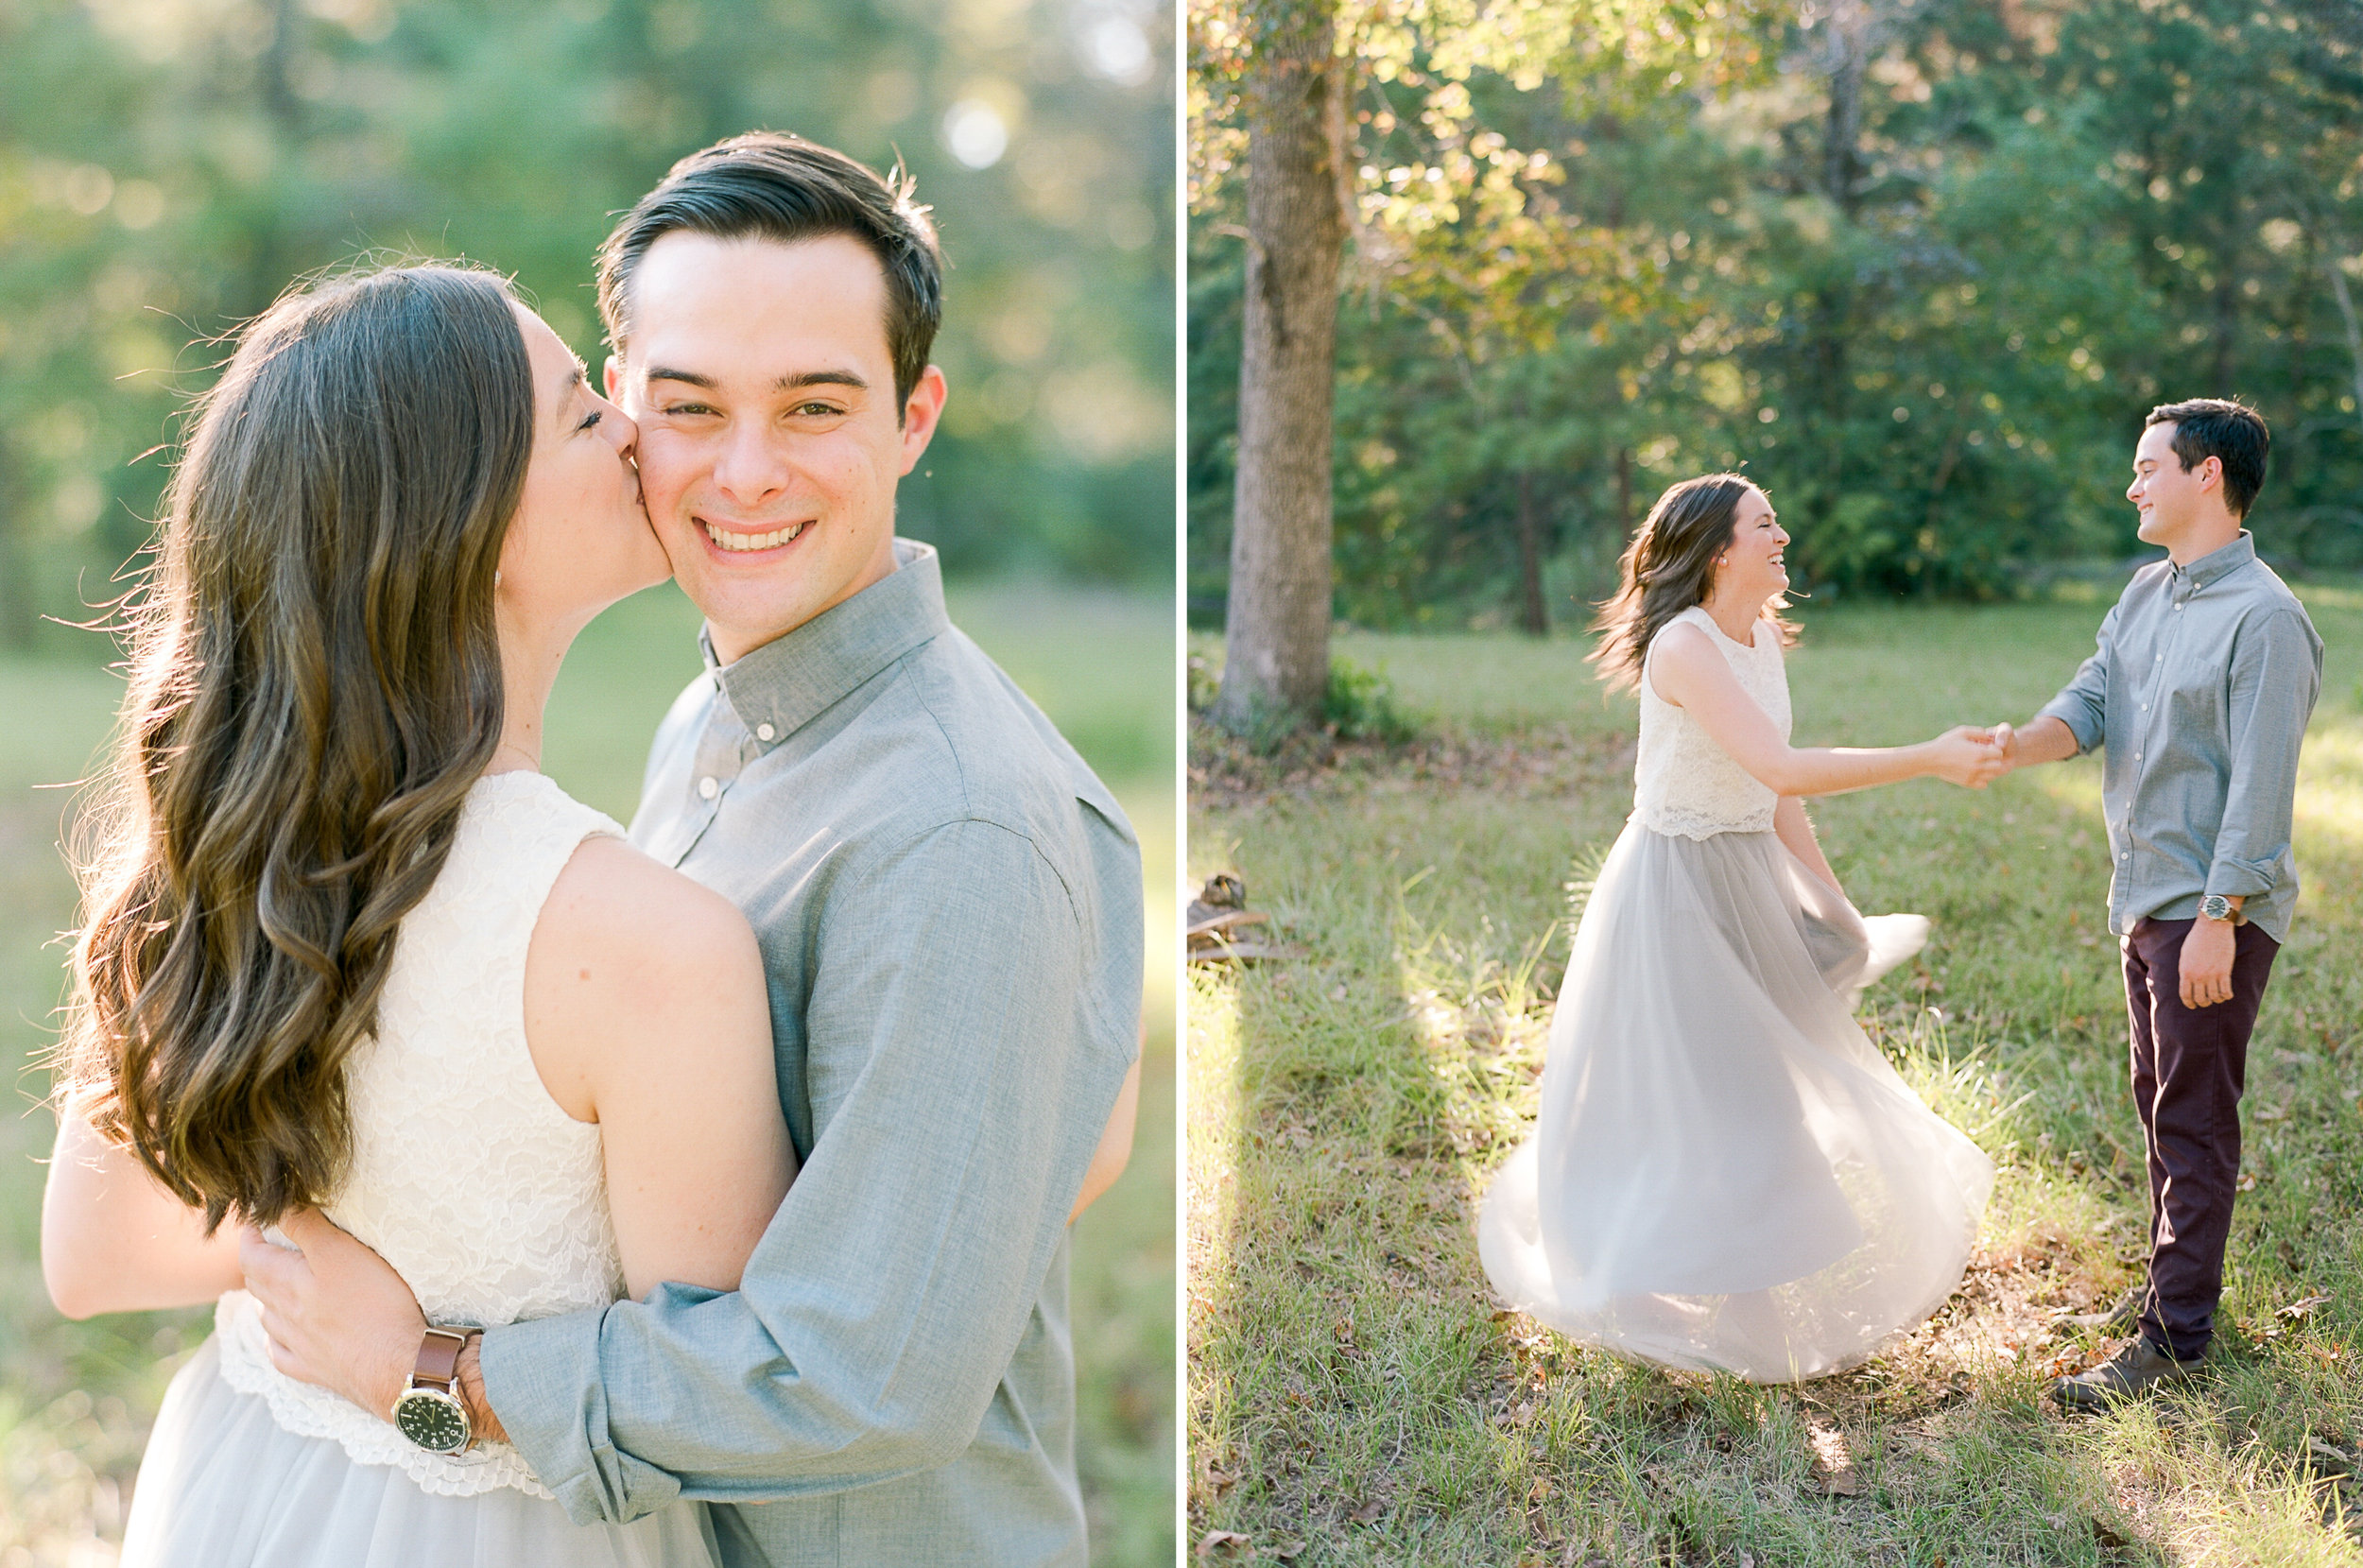 houston-wedding-photographer-college-station-austin-the-woodlands-film-photography-style-me-pretty-engagements-dana-fernandez-photography-110.jpg